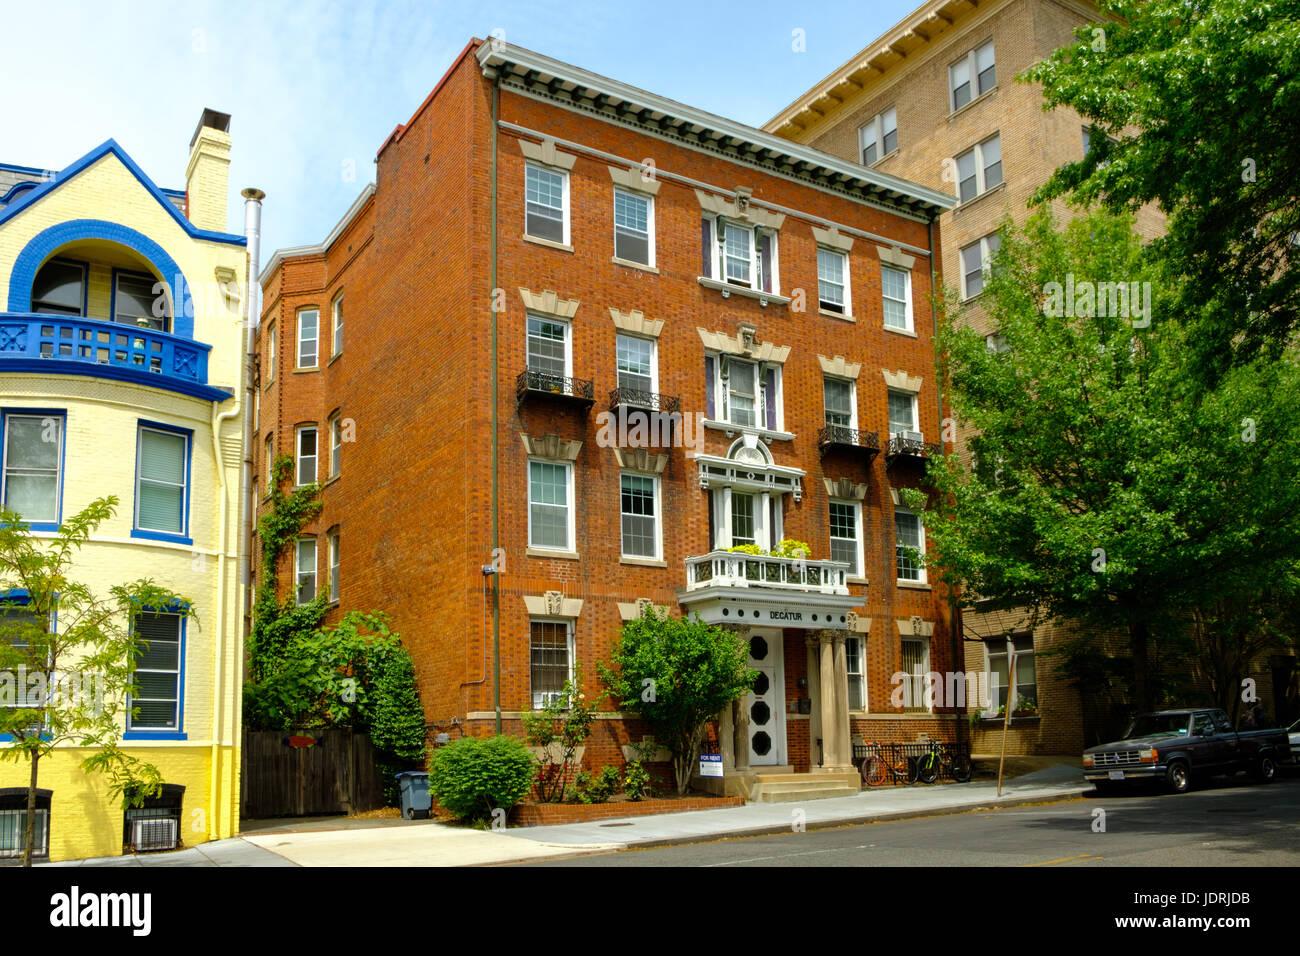 Decatur Apartments, 2131 Florida Avenue NW, Washington DC